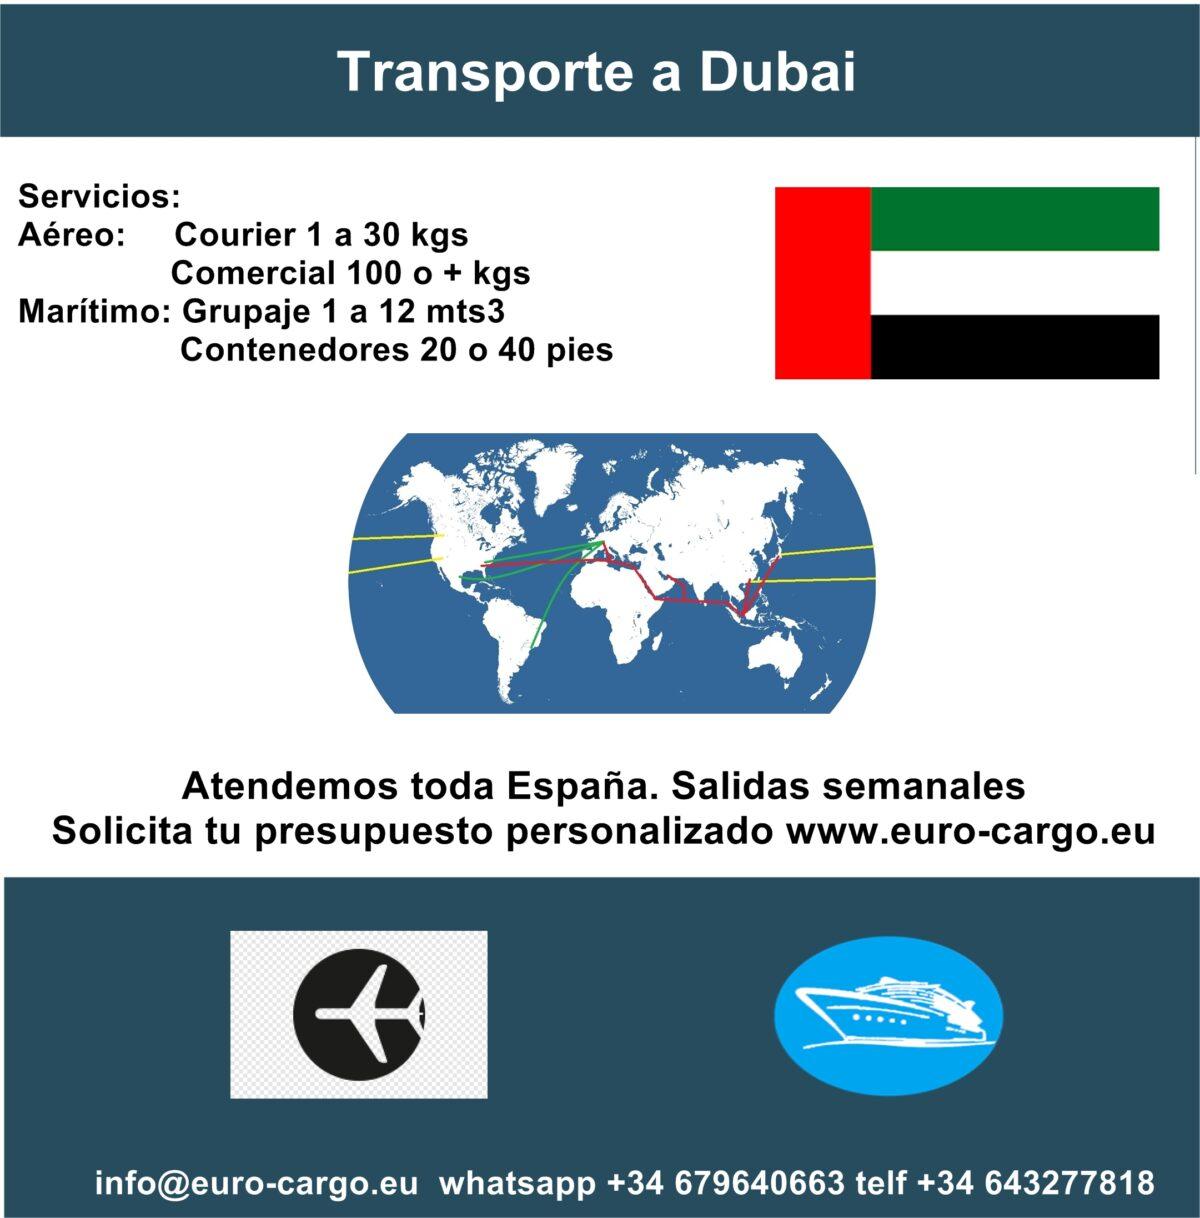 Transporte-Emiratos-Arabes-1-1200x1218.jpg